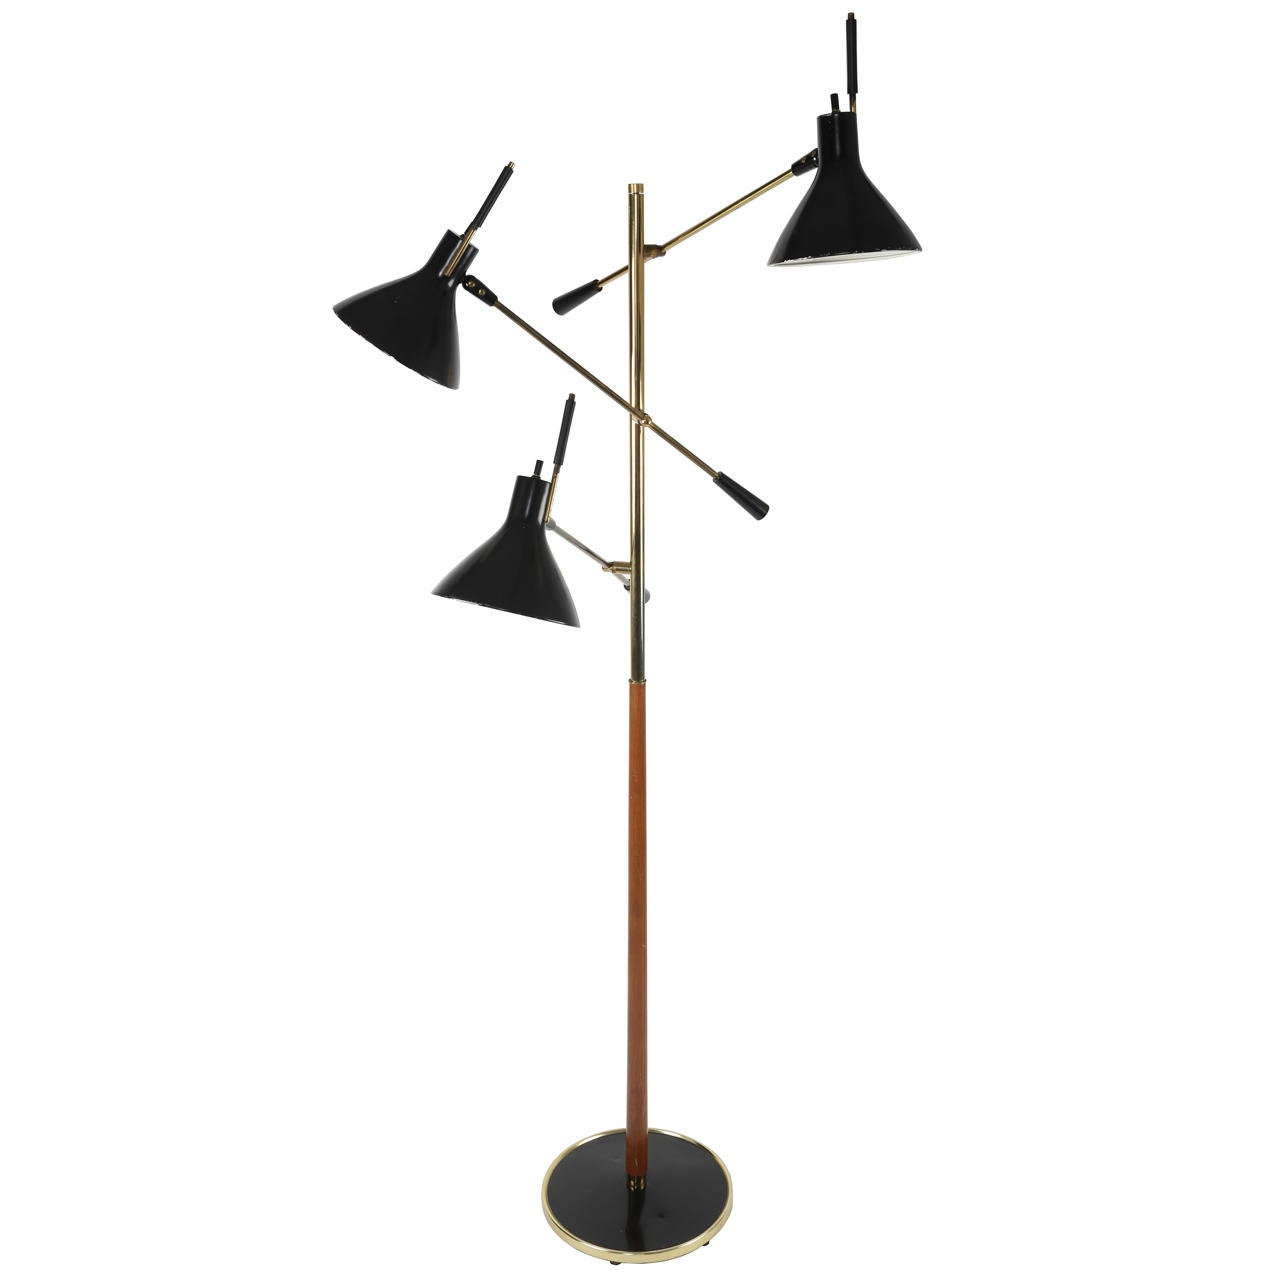 Gerald Thurston for Lightolier Three-Arm Floor Lamp at 1stdibs